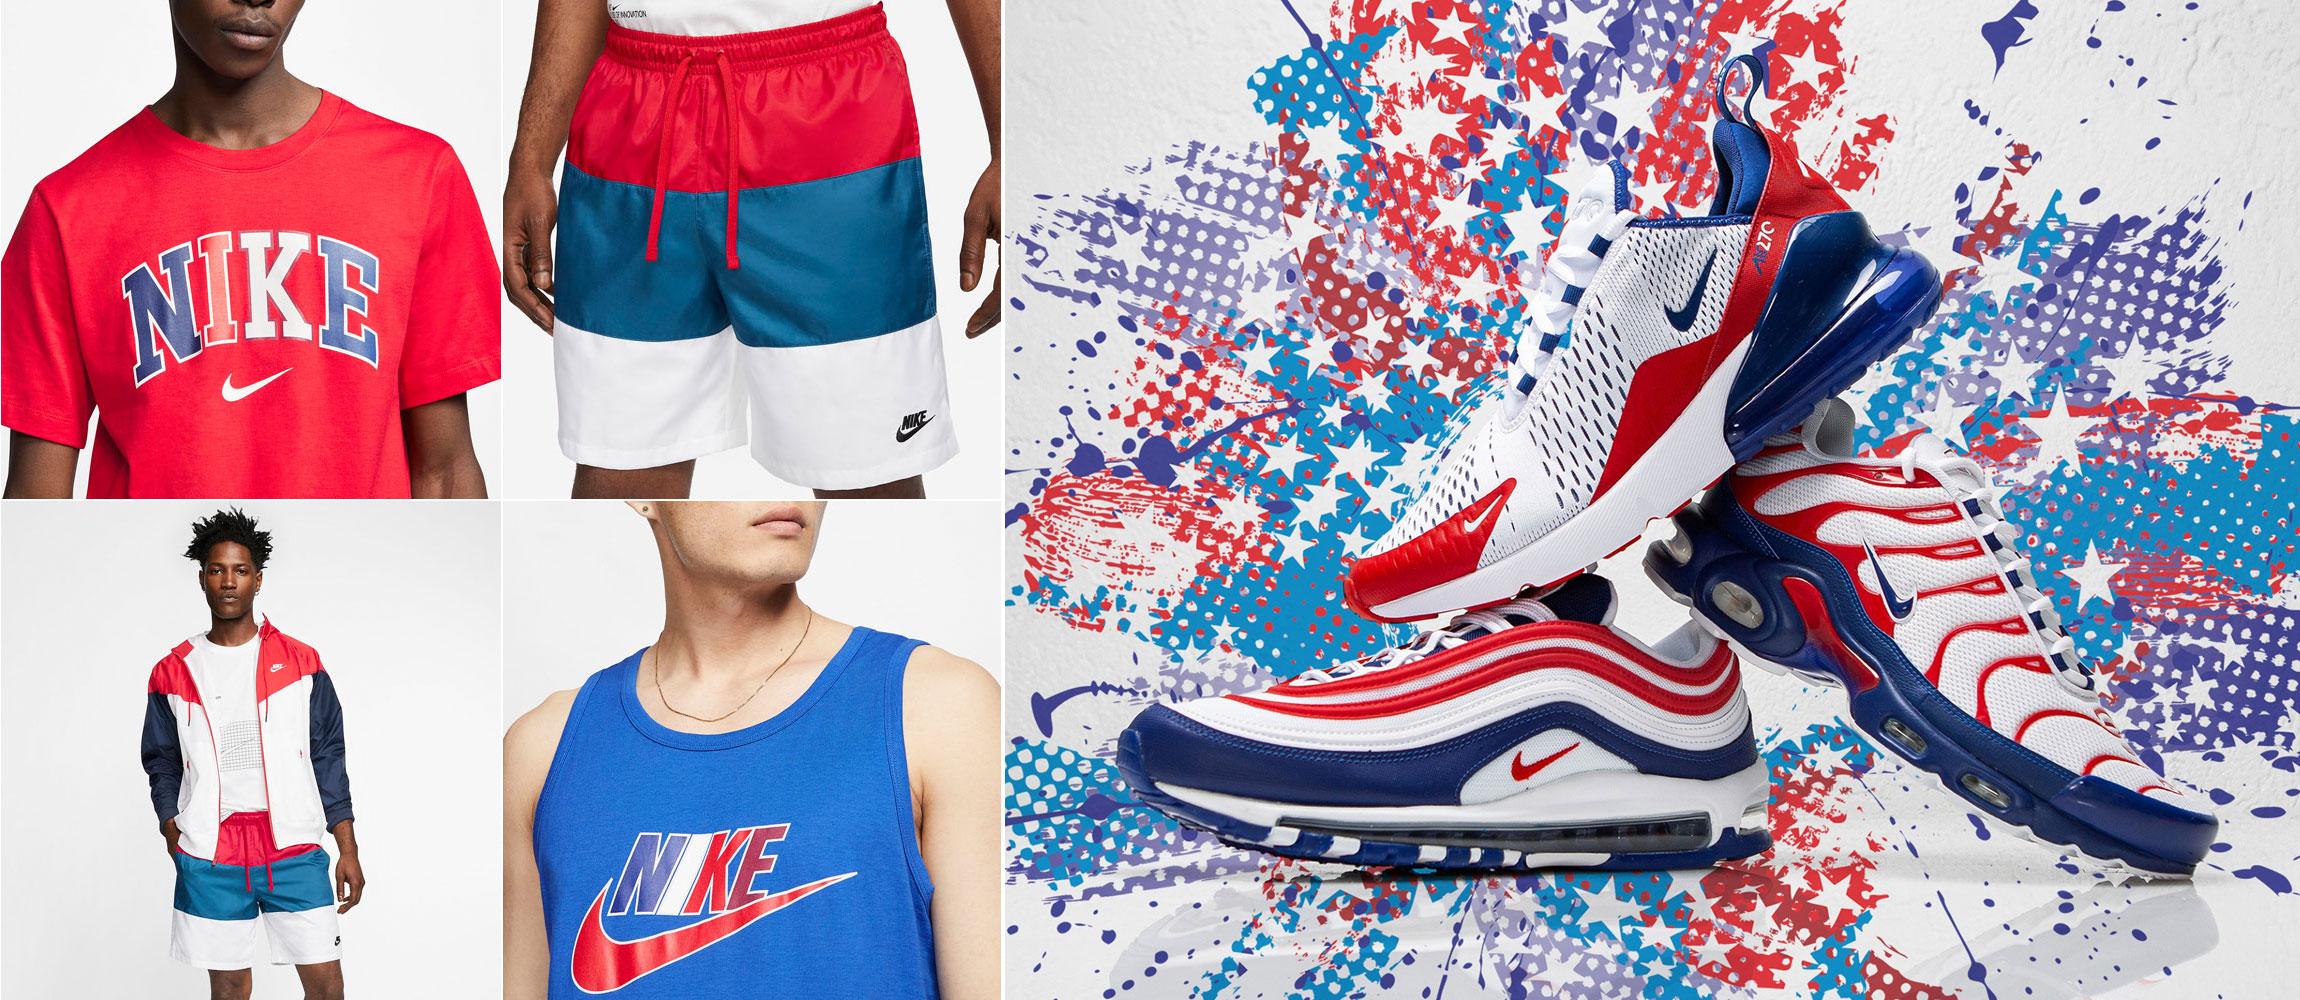 nike-usa-4th-of-july-americana-shoes-apparel